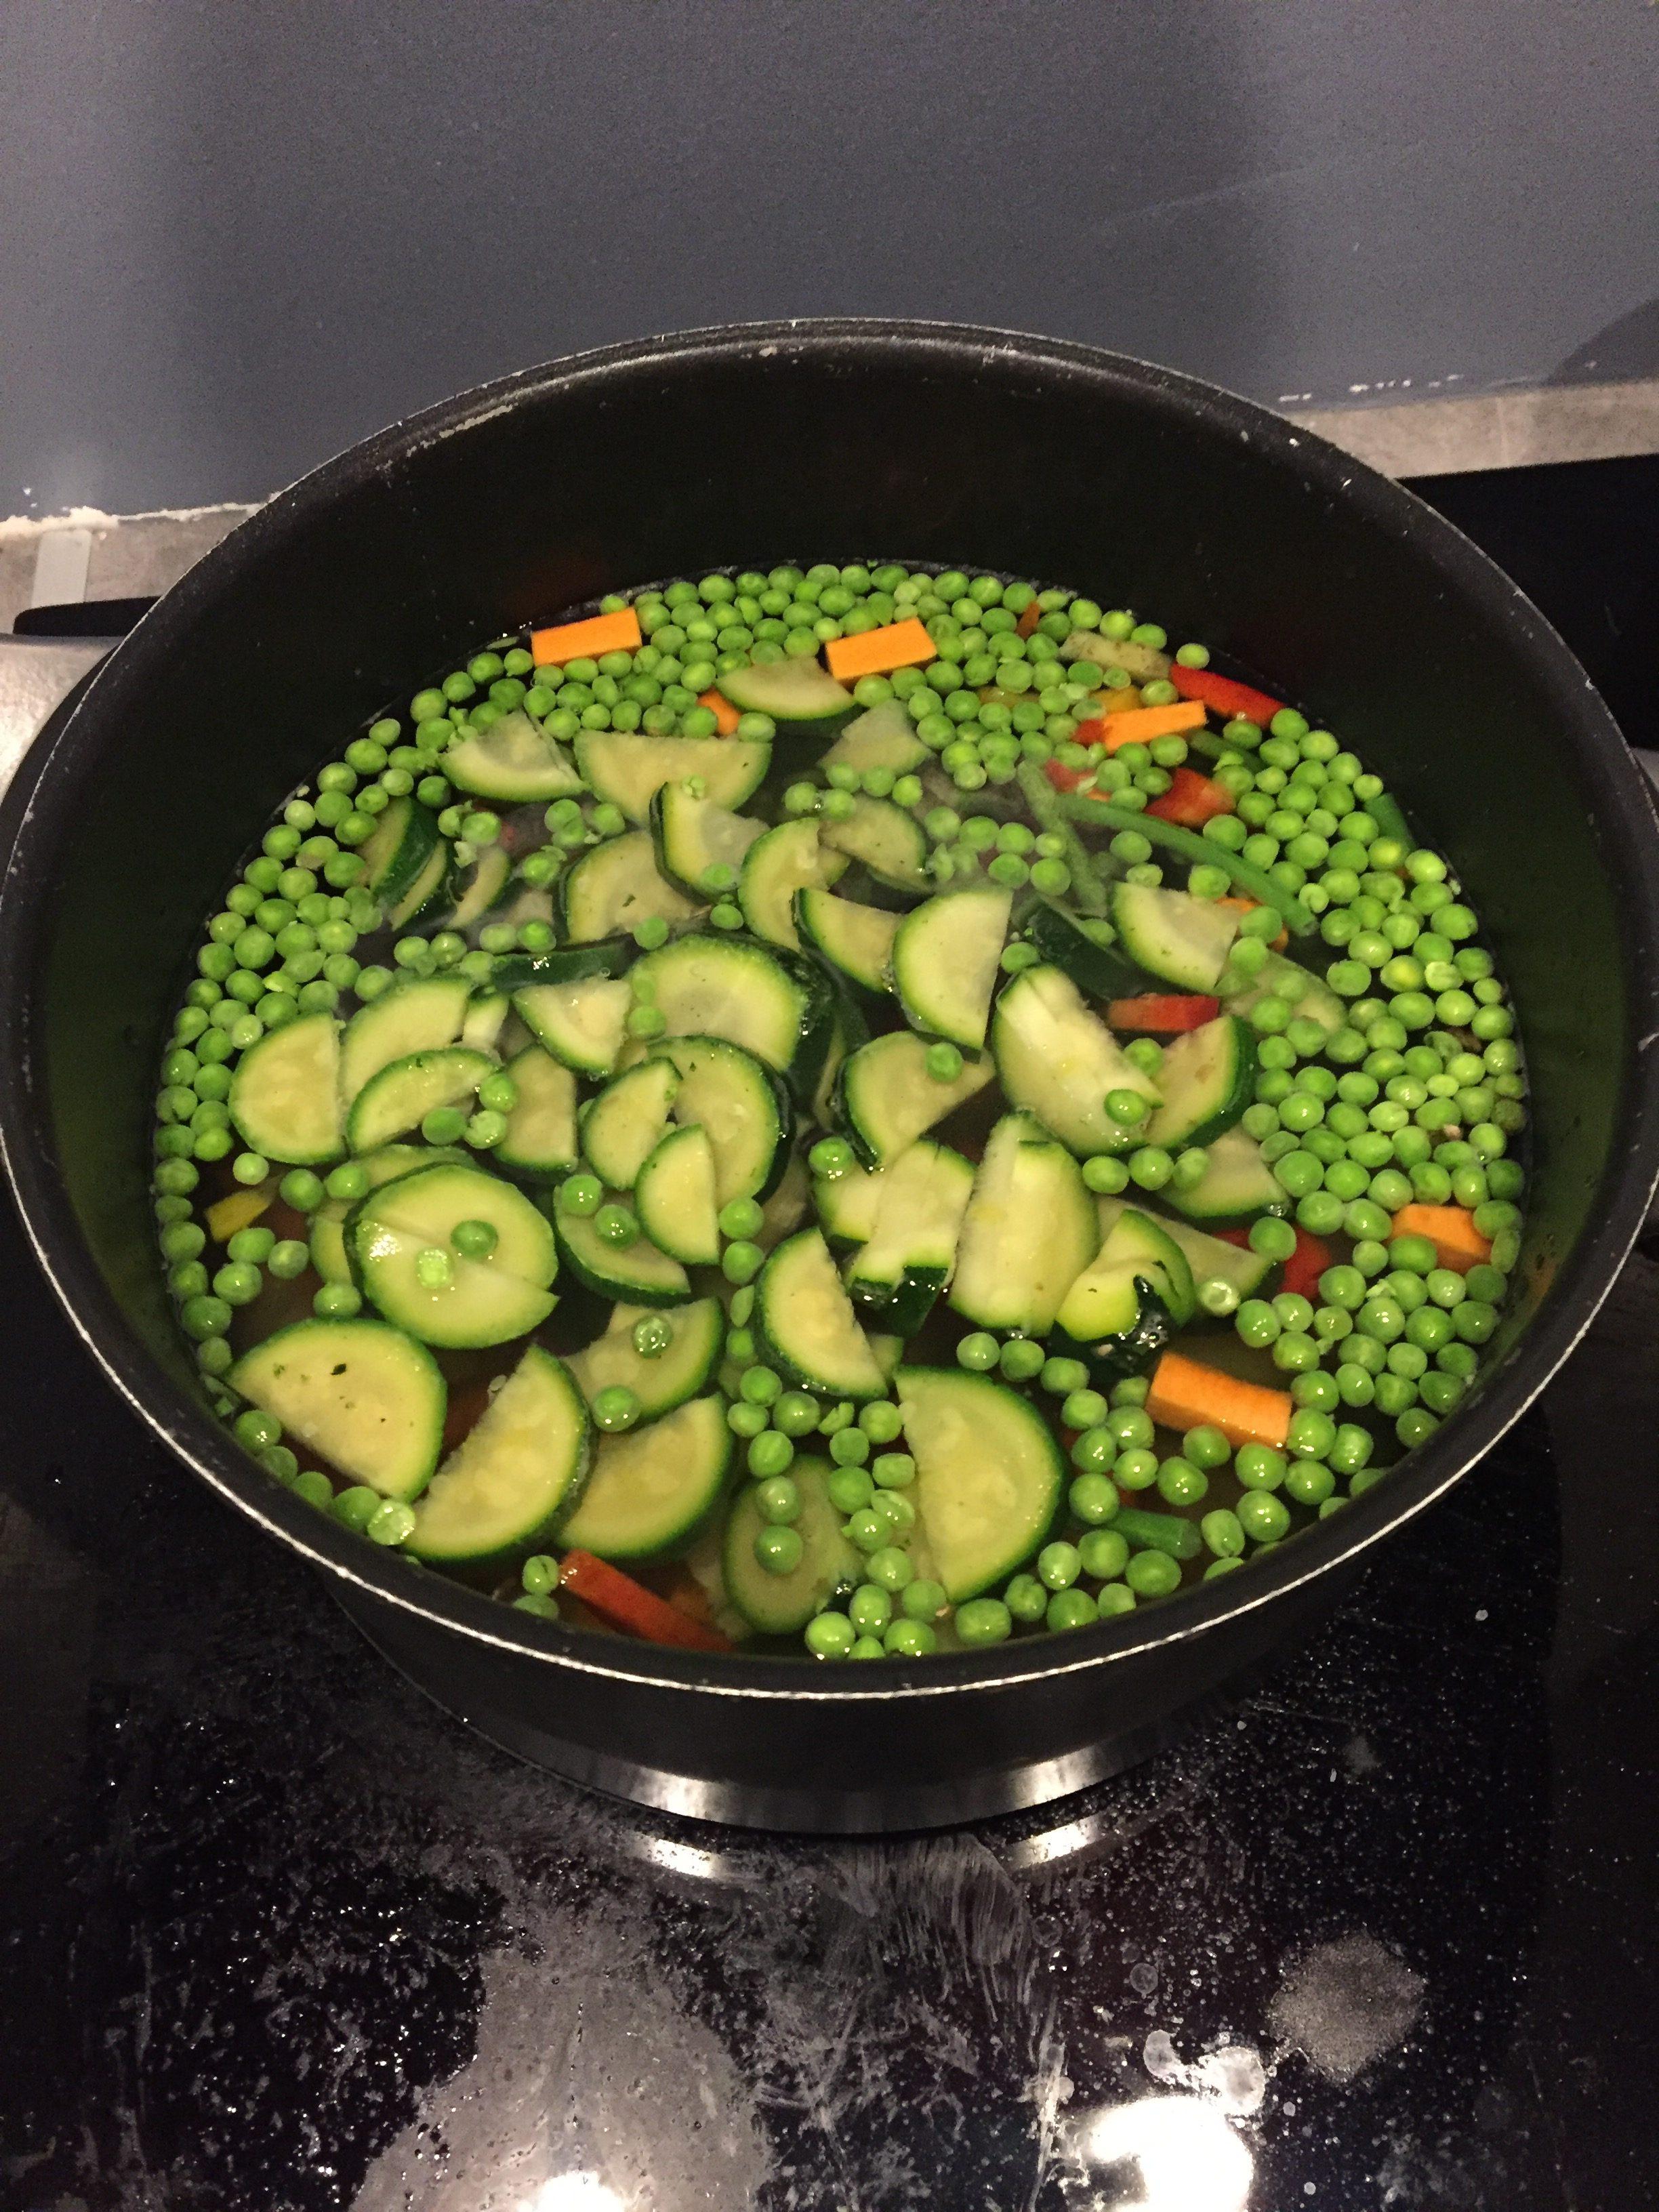 cabillaud, petits légumes croquants